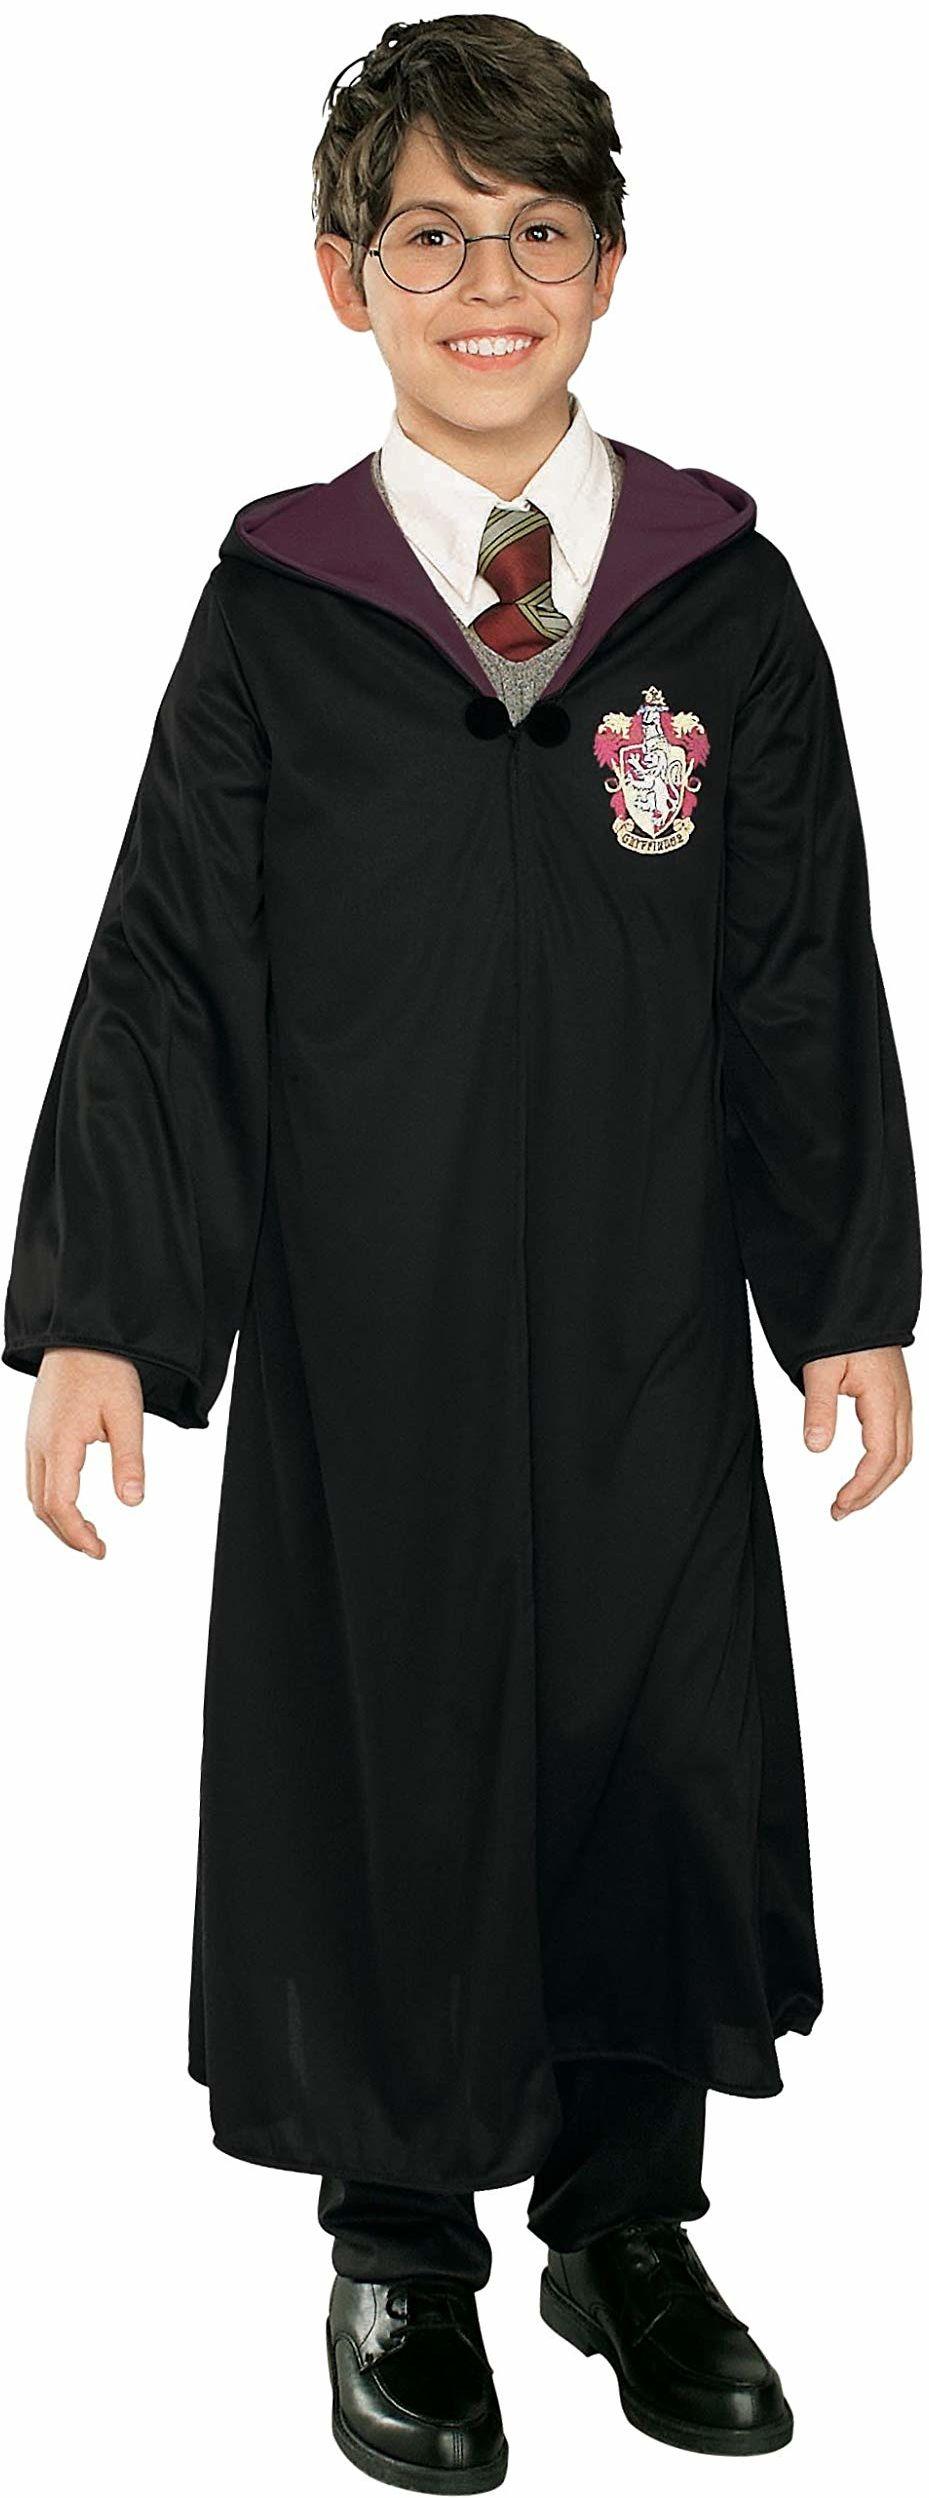 Rubie''s 3 883284-1 - Harry Potter Robe Rozmiar: S